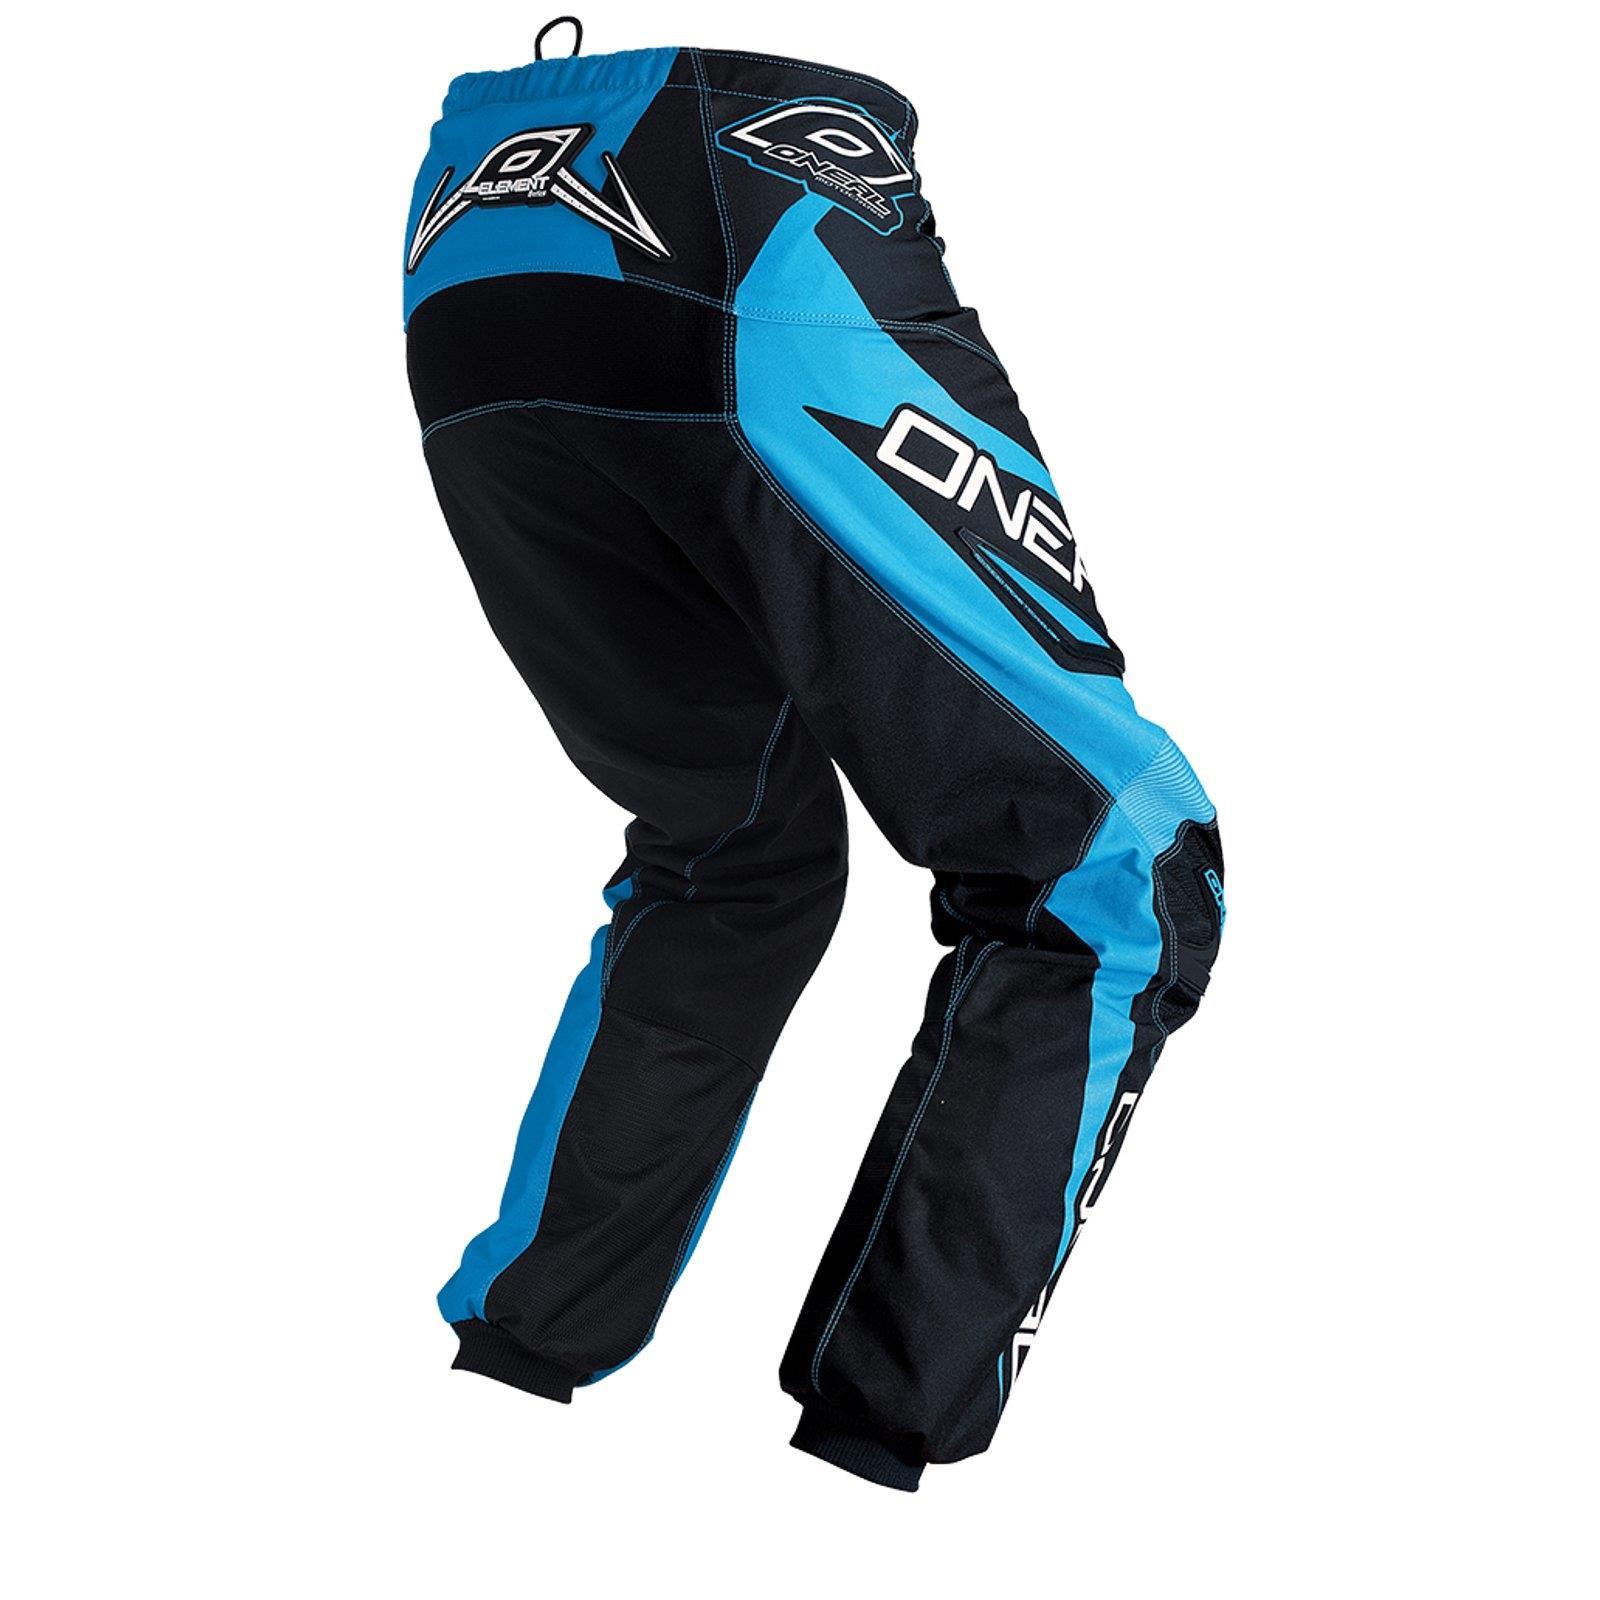 ONeal-pantalones-de-Jersey-de-los-ninos-de-pantalones-cortos-ninos-MX-bicicleta-DH-montana-bicicleta miniatura 105